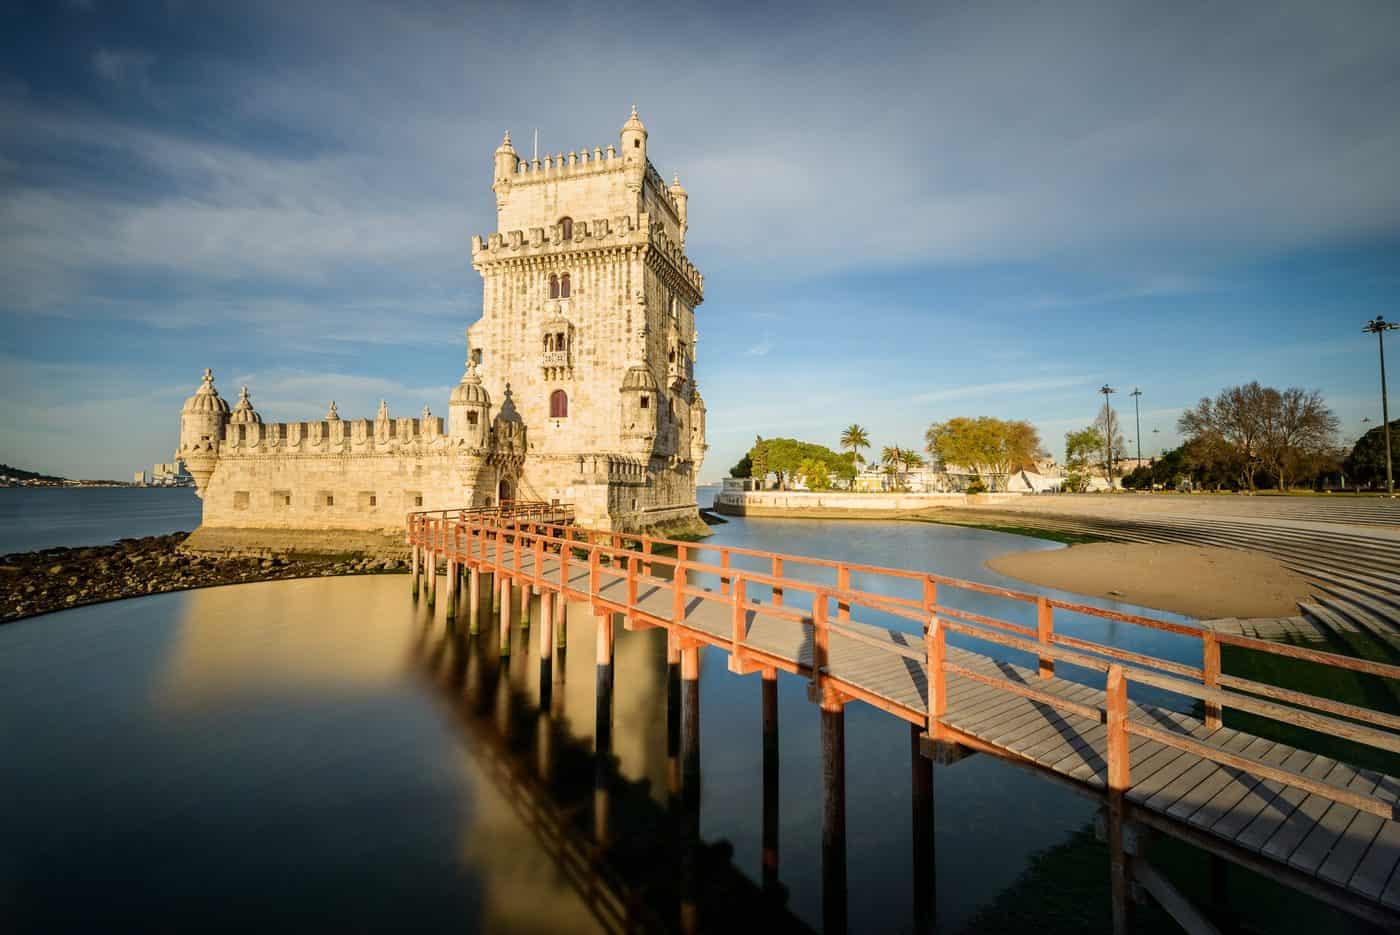 Portugal Reise-Tipps – Torre de Belém (Turm von Belém) in Lissabon